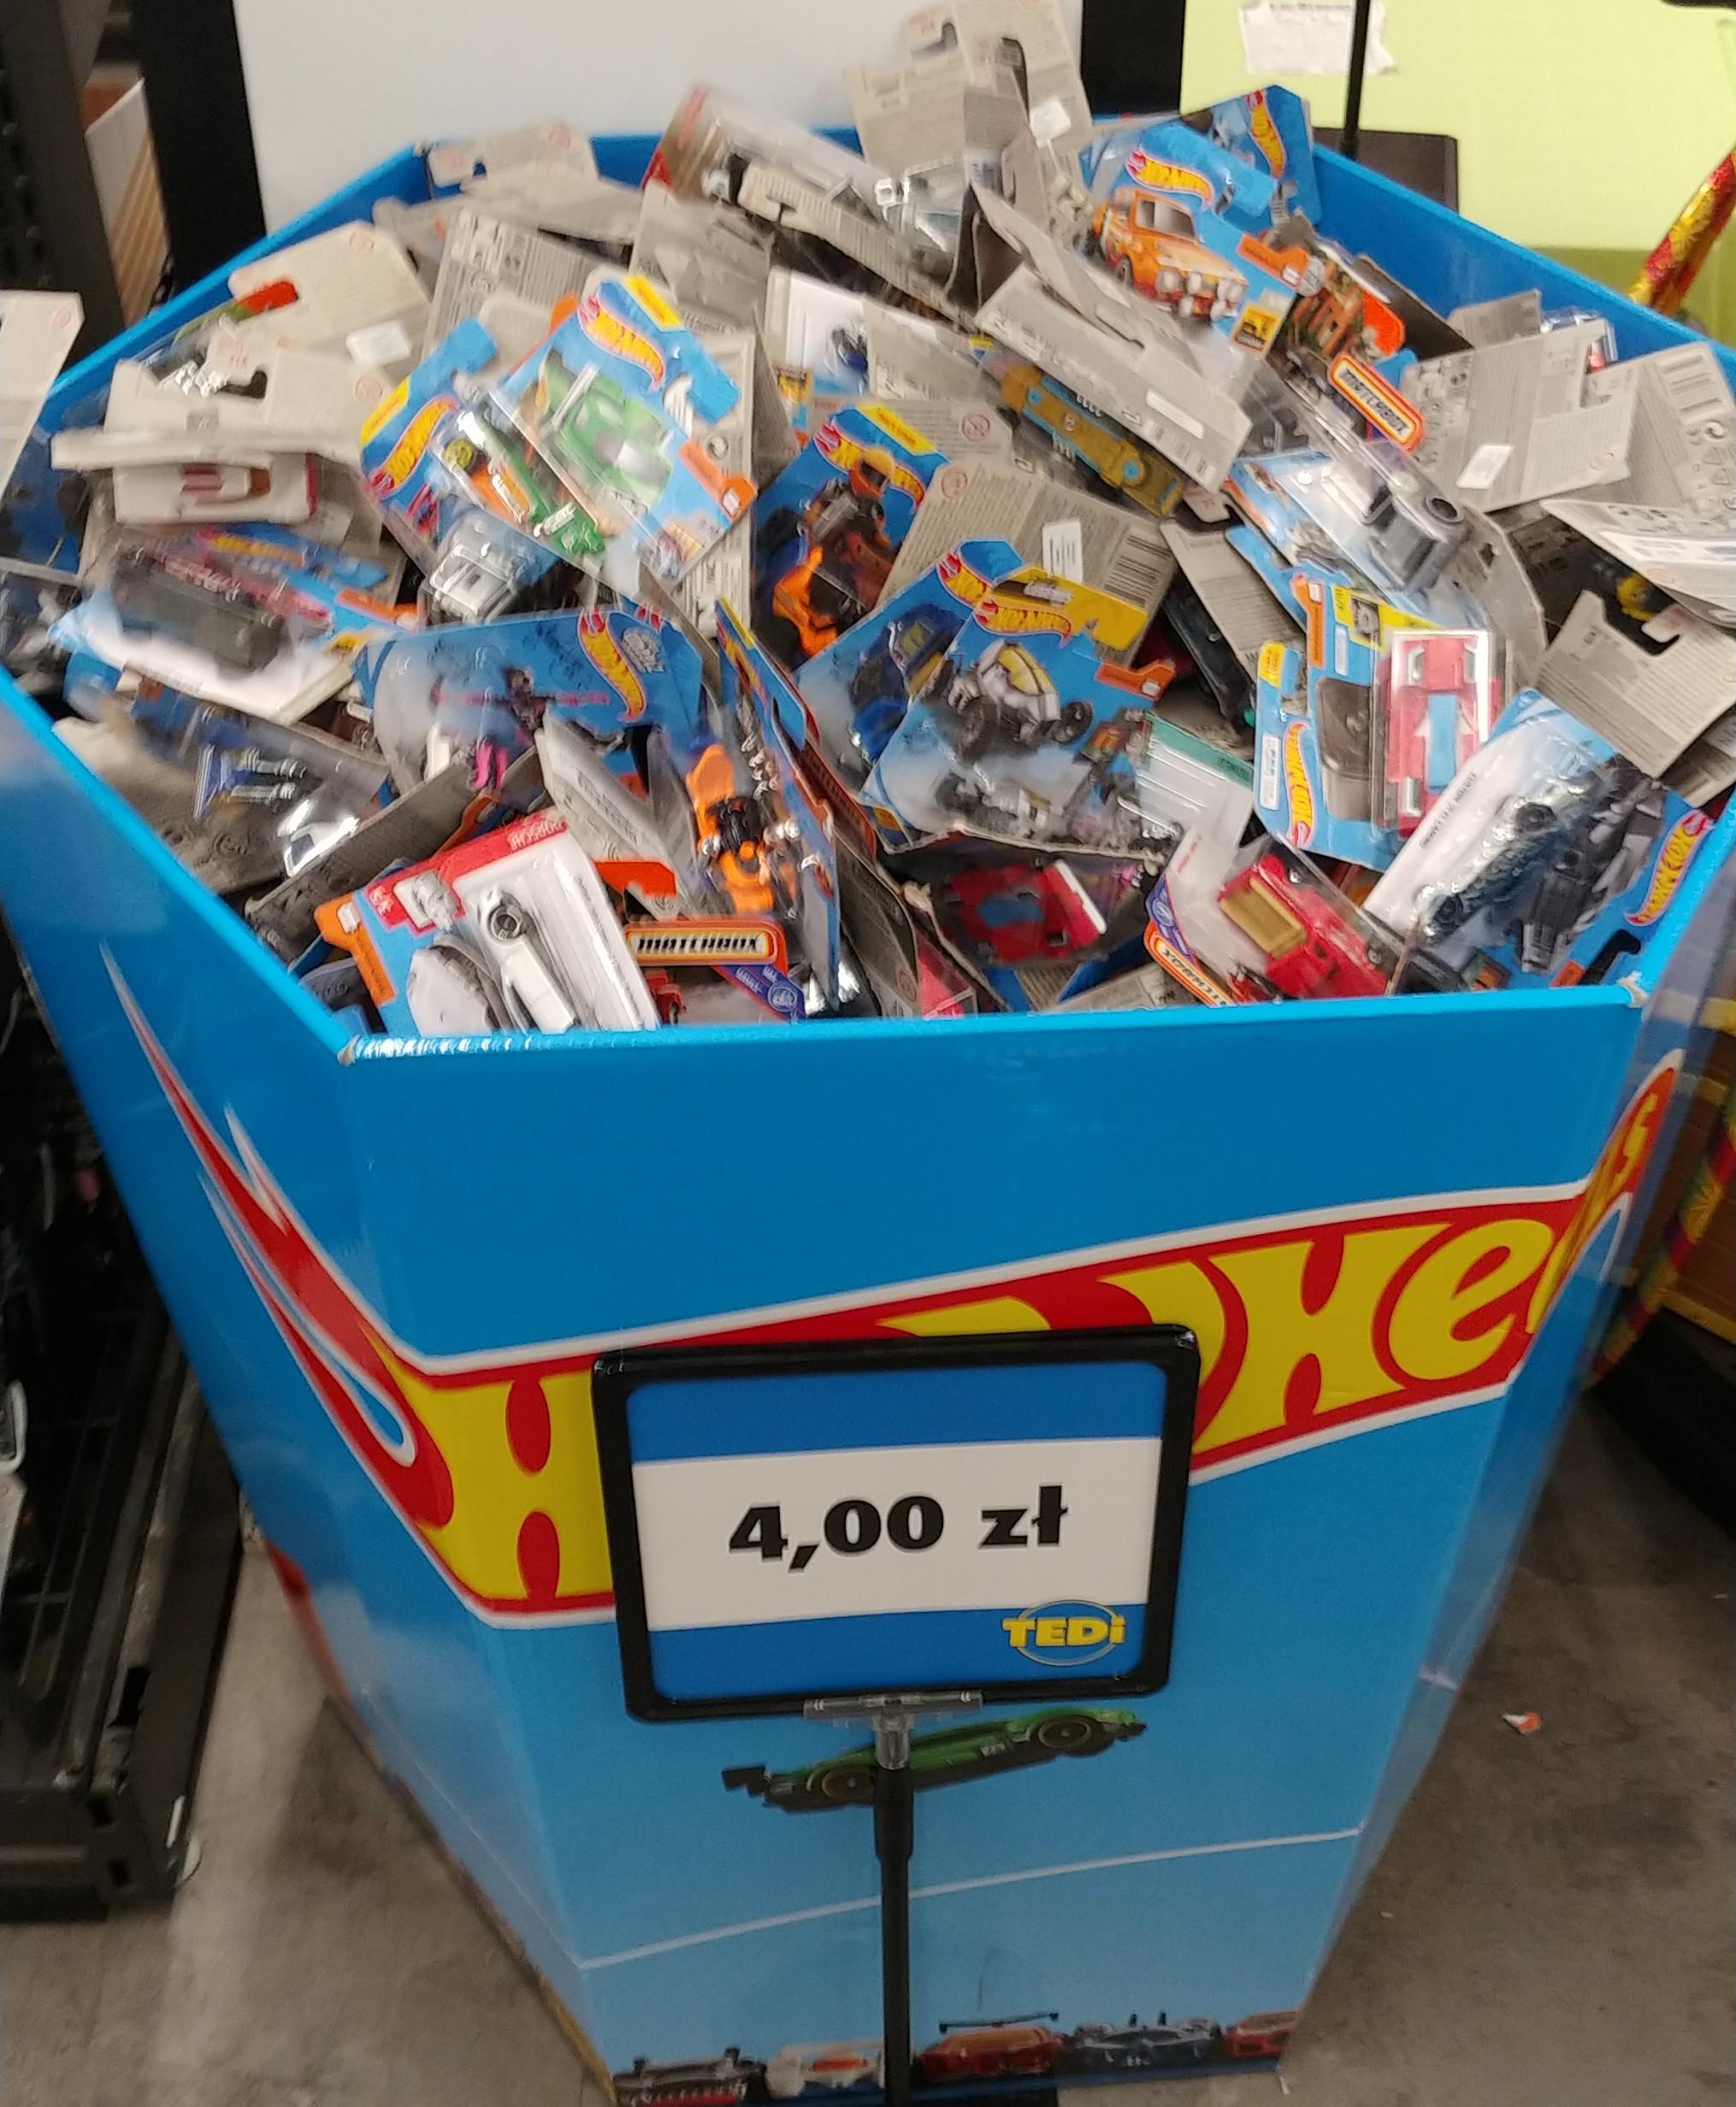 Hot wheels i matchbox w Tedi warszawa